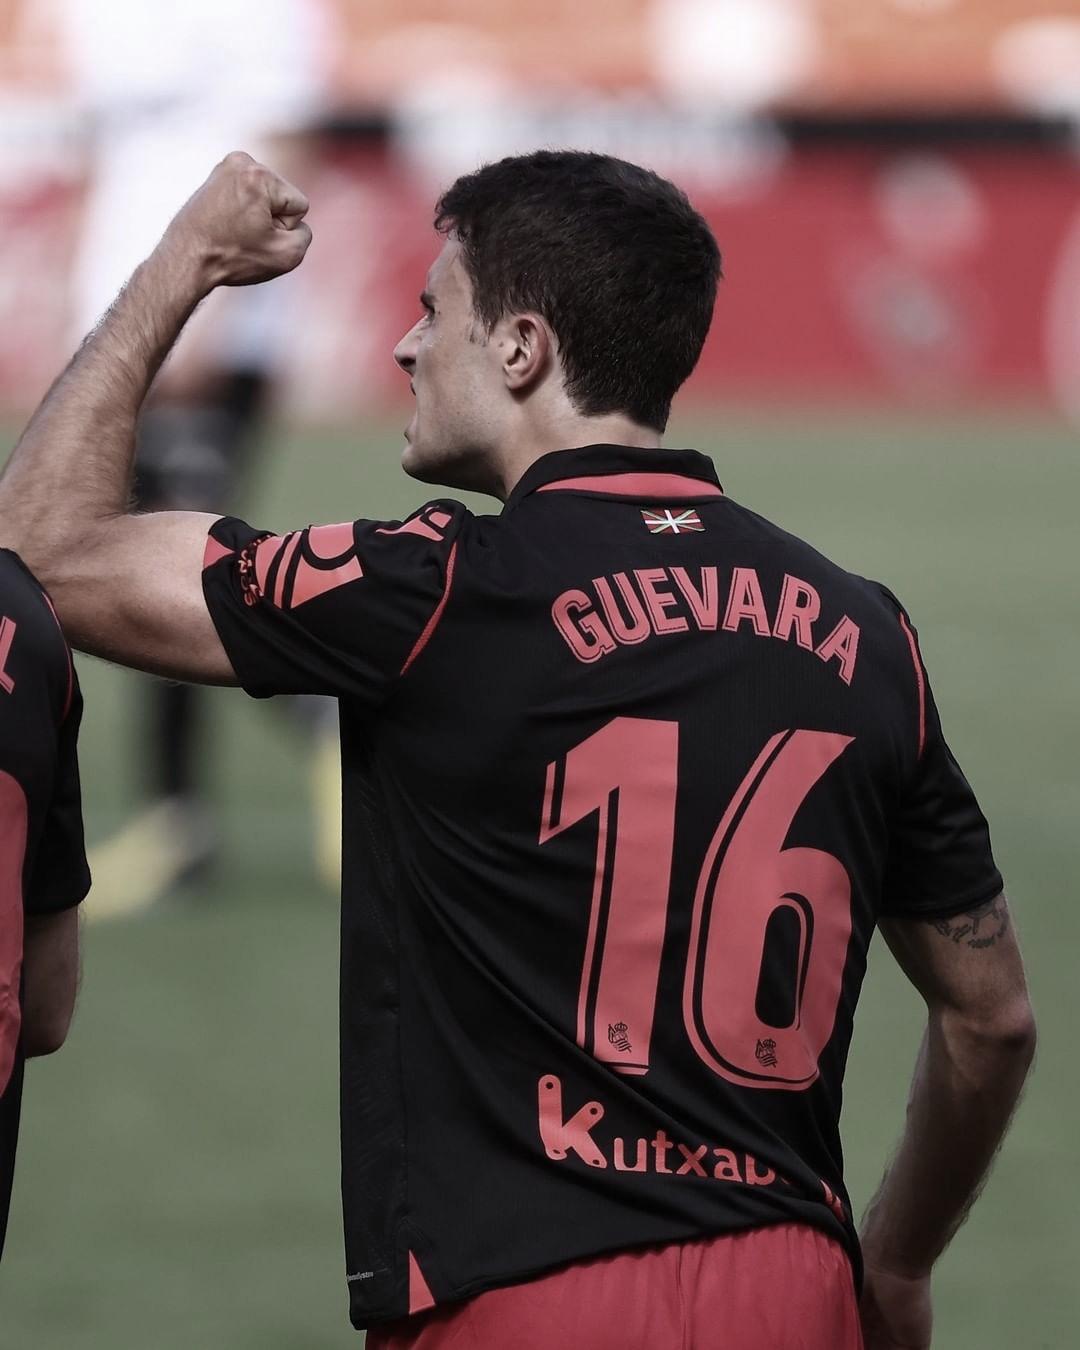 Previa Real Sociedad - Sevilla: a seguir luchando por Europa